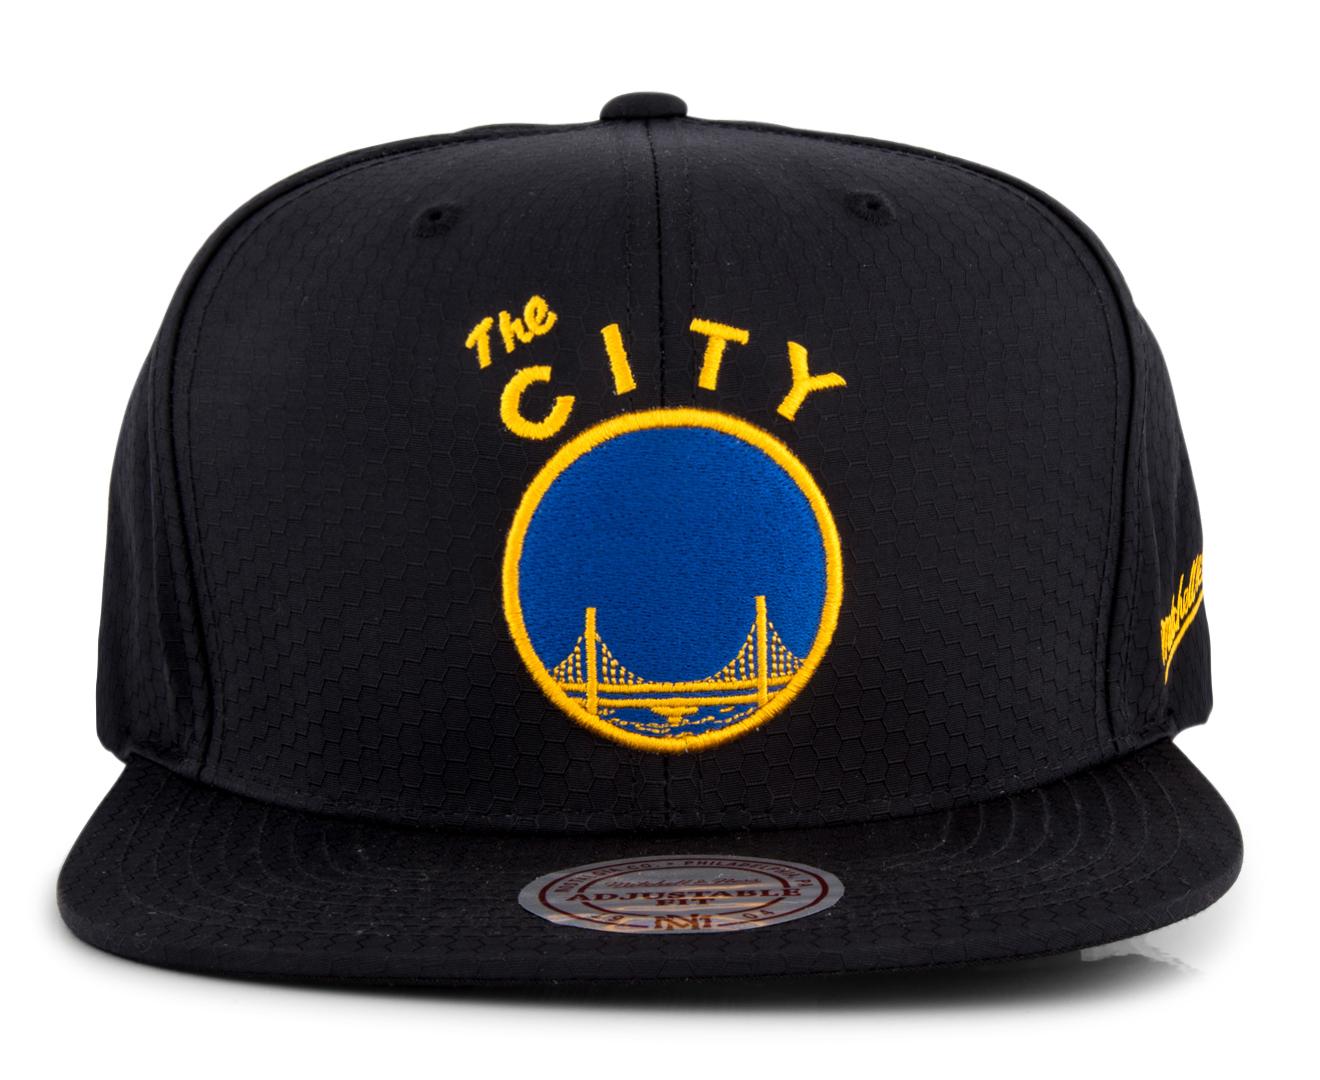 buy online 3bd89 1242c Mitchell   Ness Ripstop Honeycomb Snapback Hat - Golden State Warriors    Catch.com.au